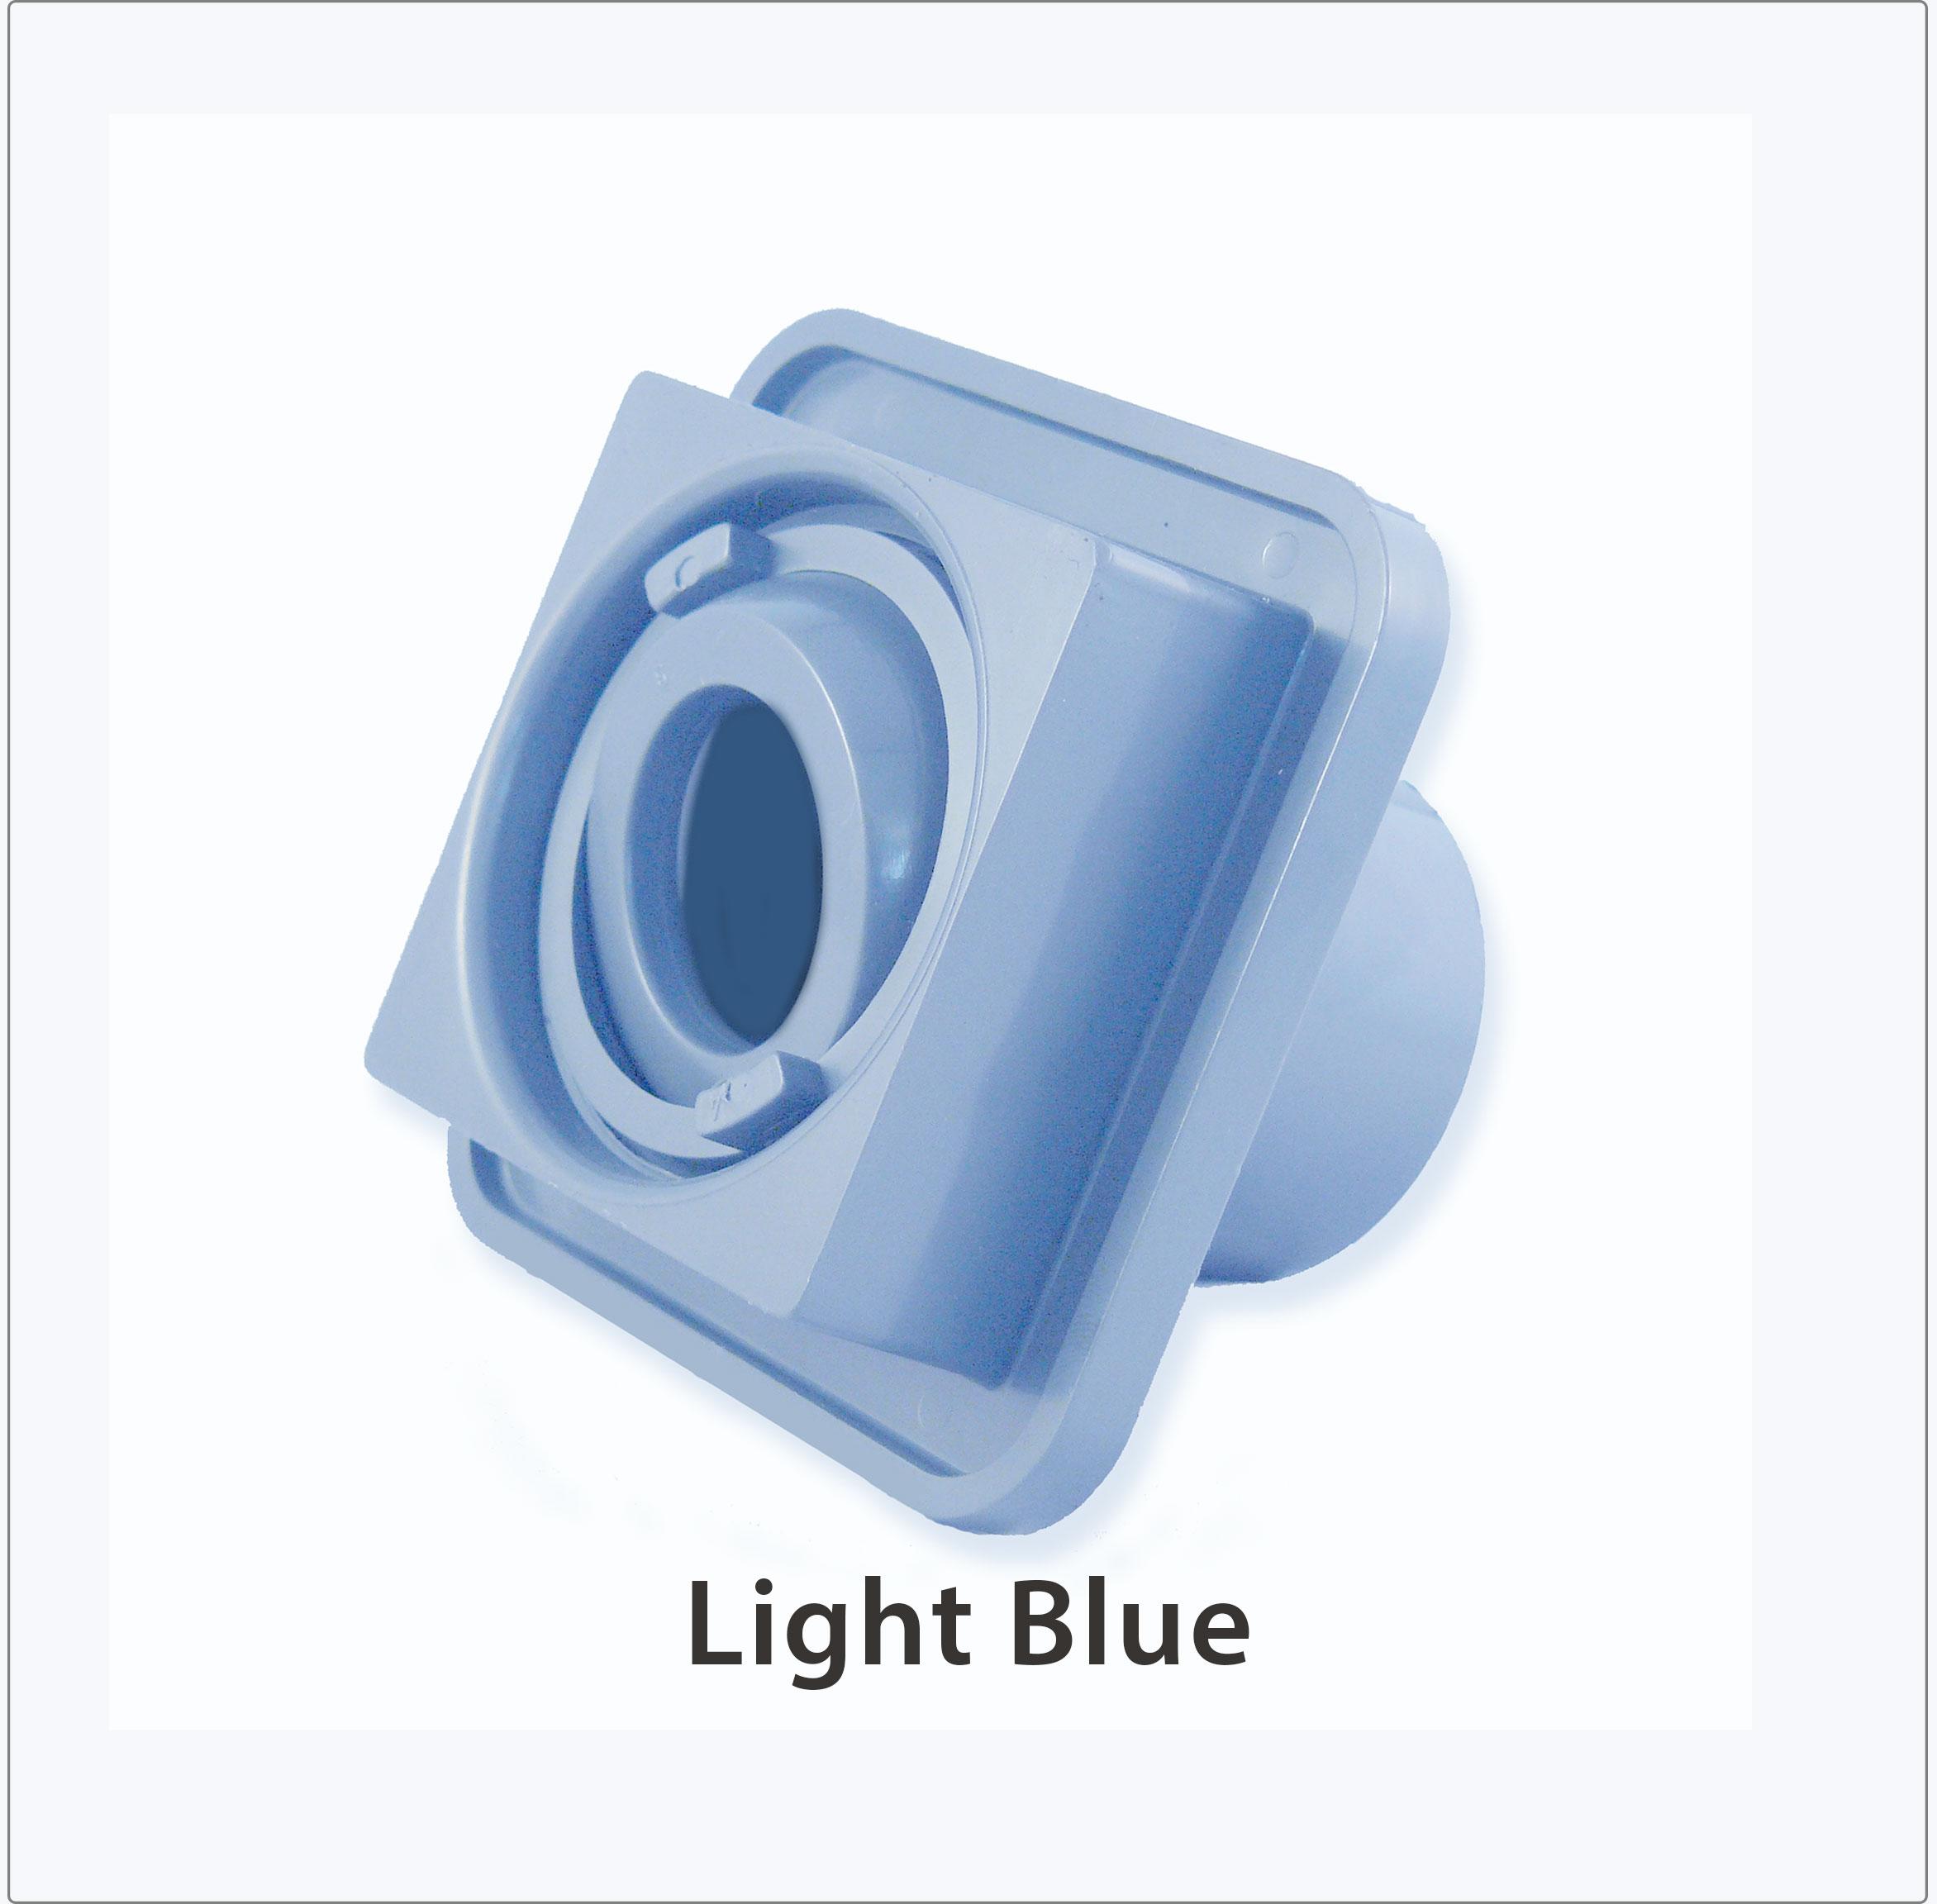 Square-Flush-Mount-Light-Blue-Mockup.jpg